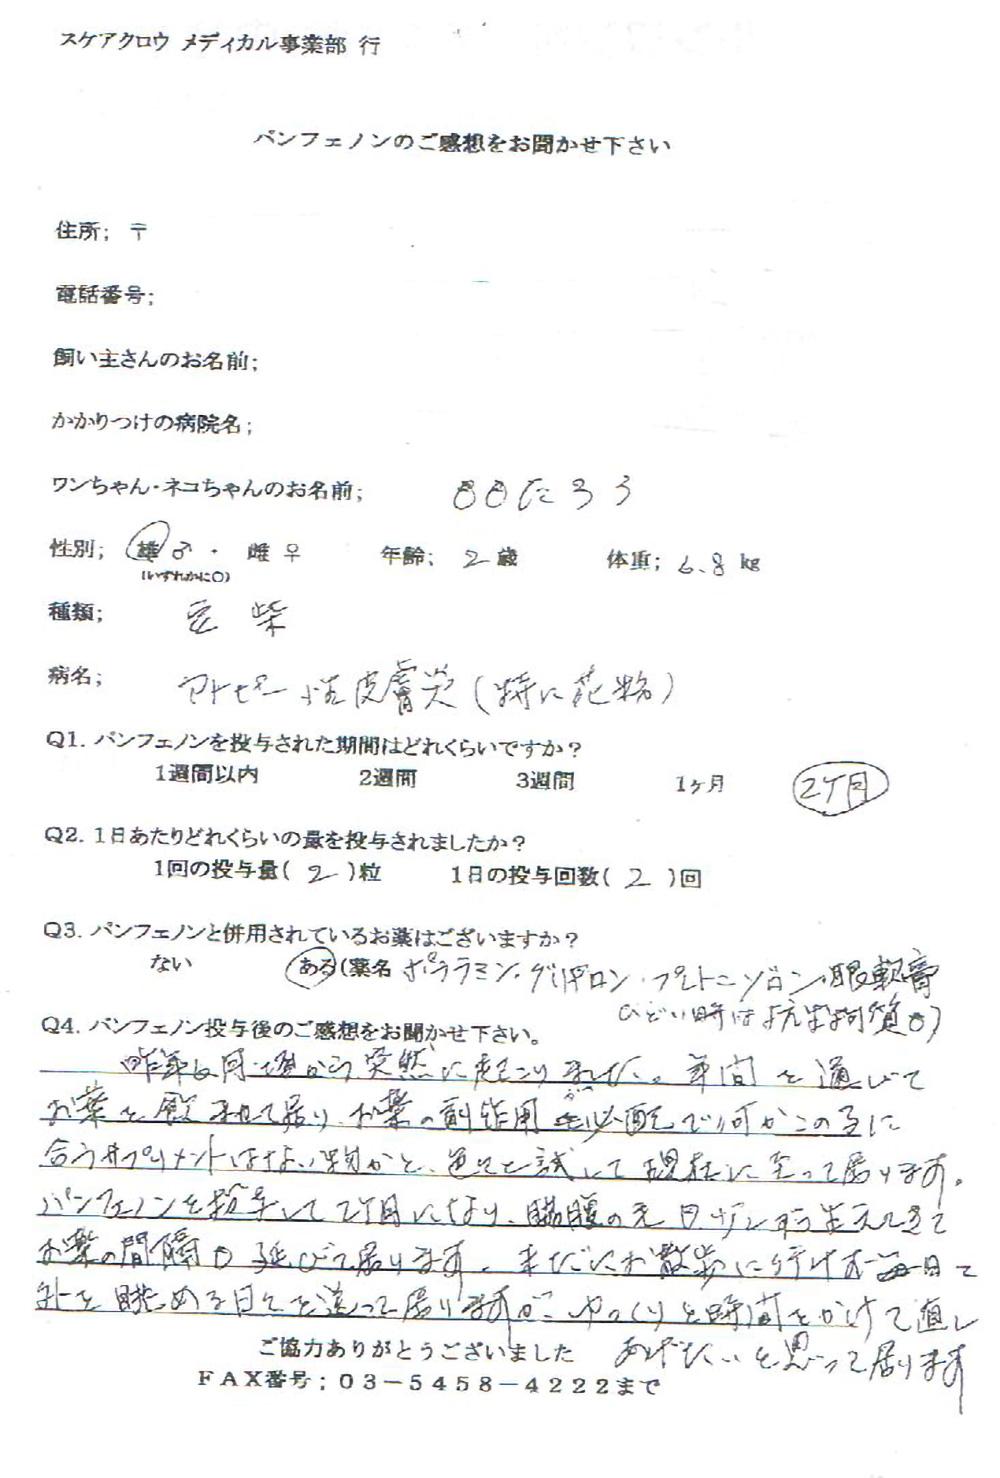 shiba-fax